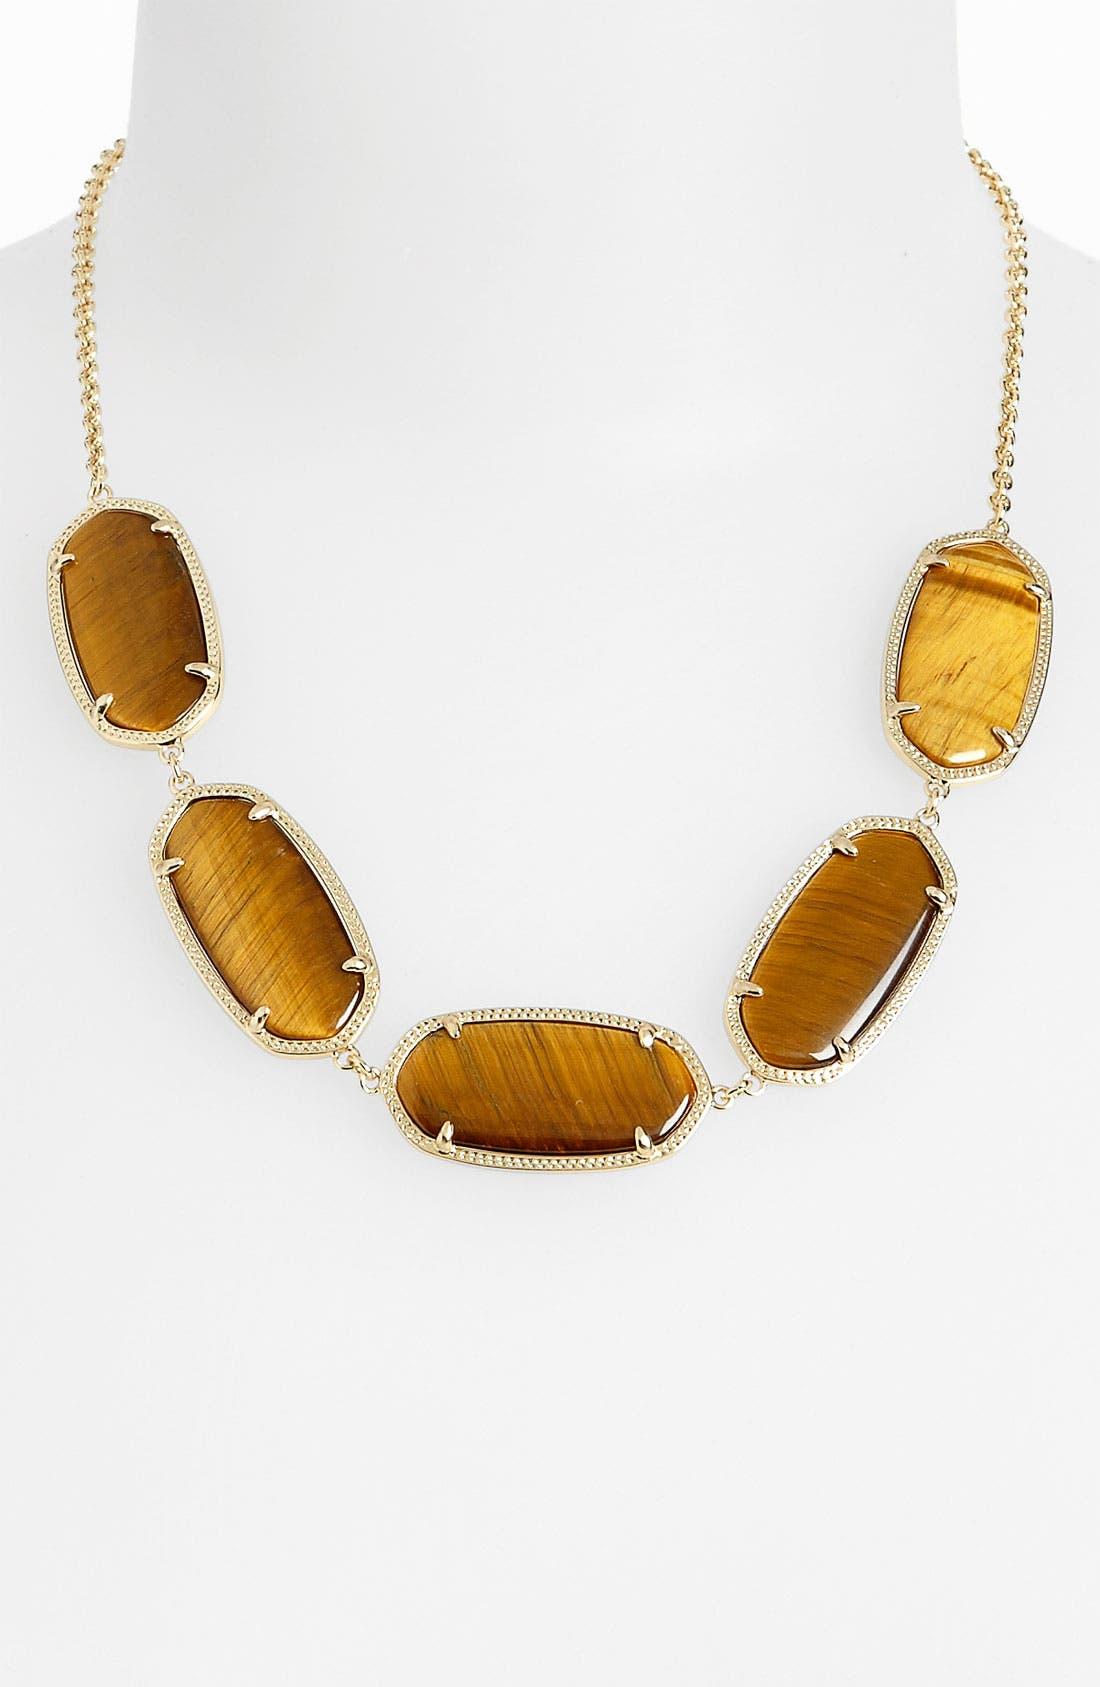 Main Image - Kendra Scott 'Aimee' Collar Necklace